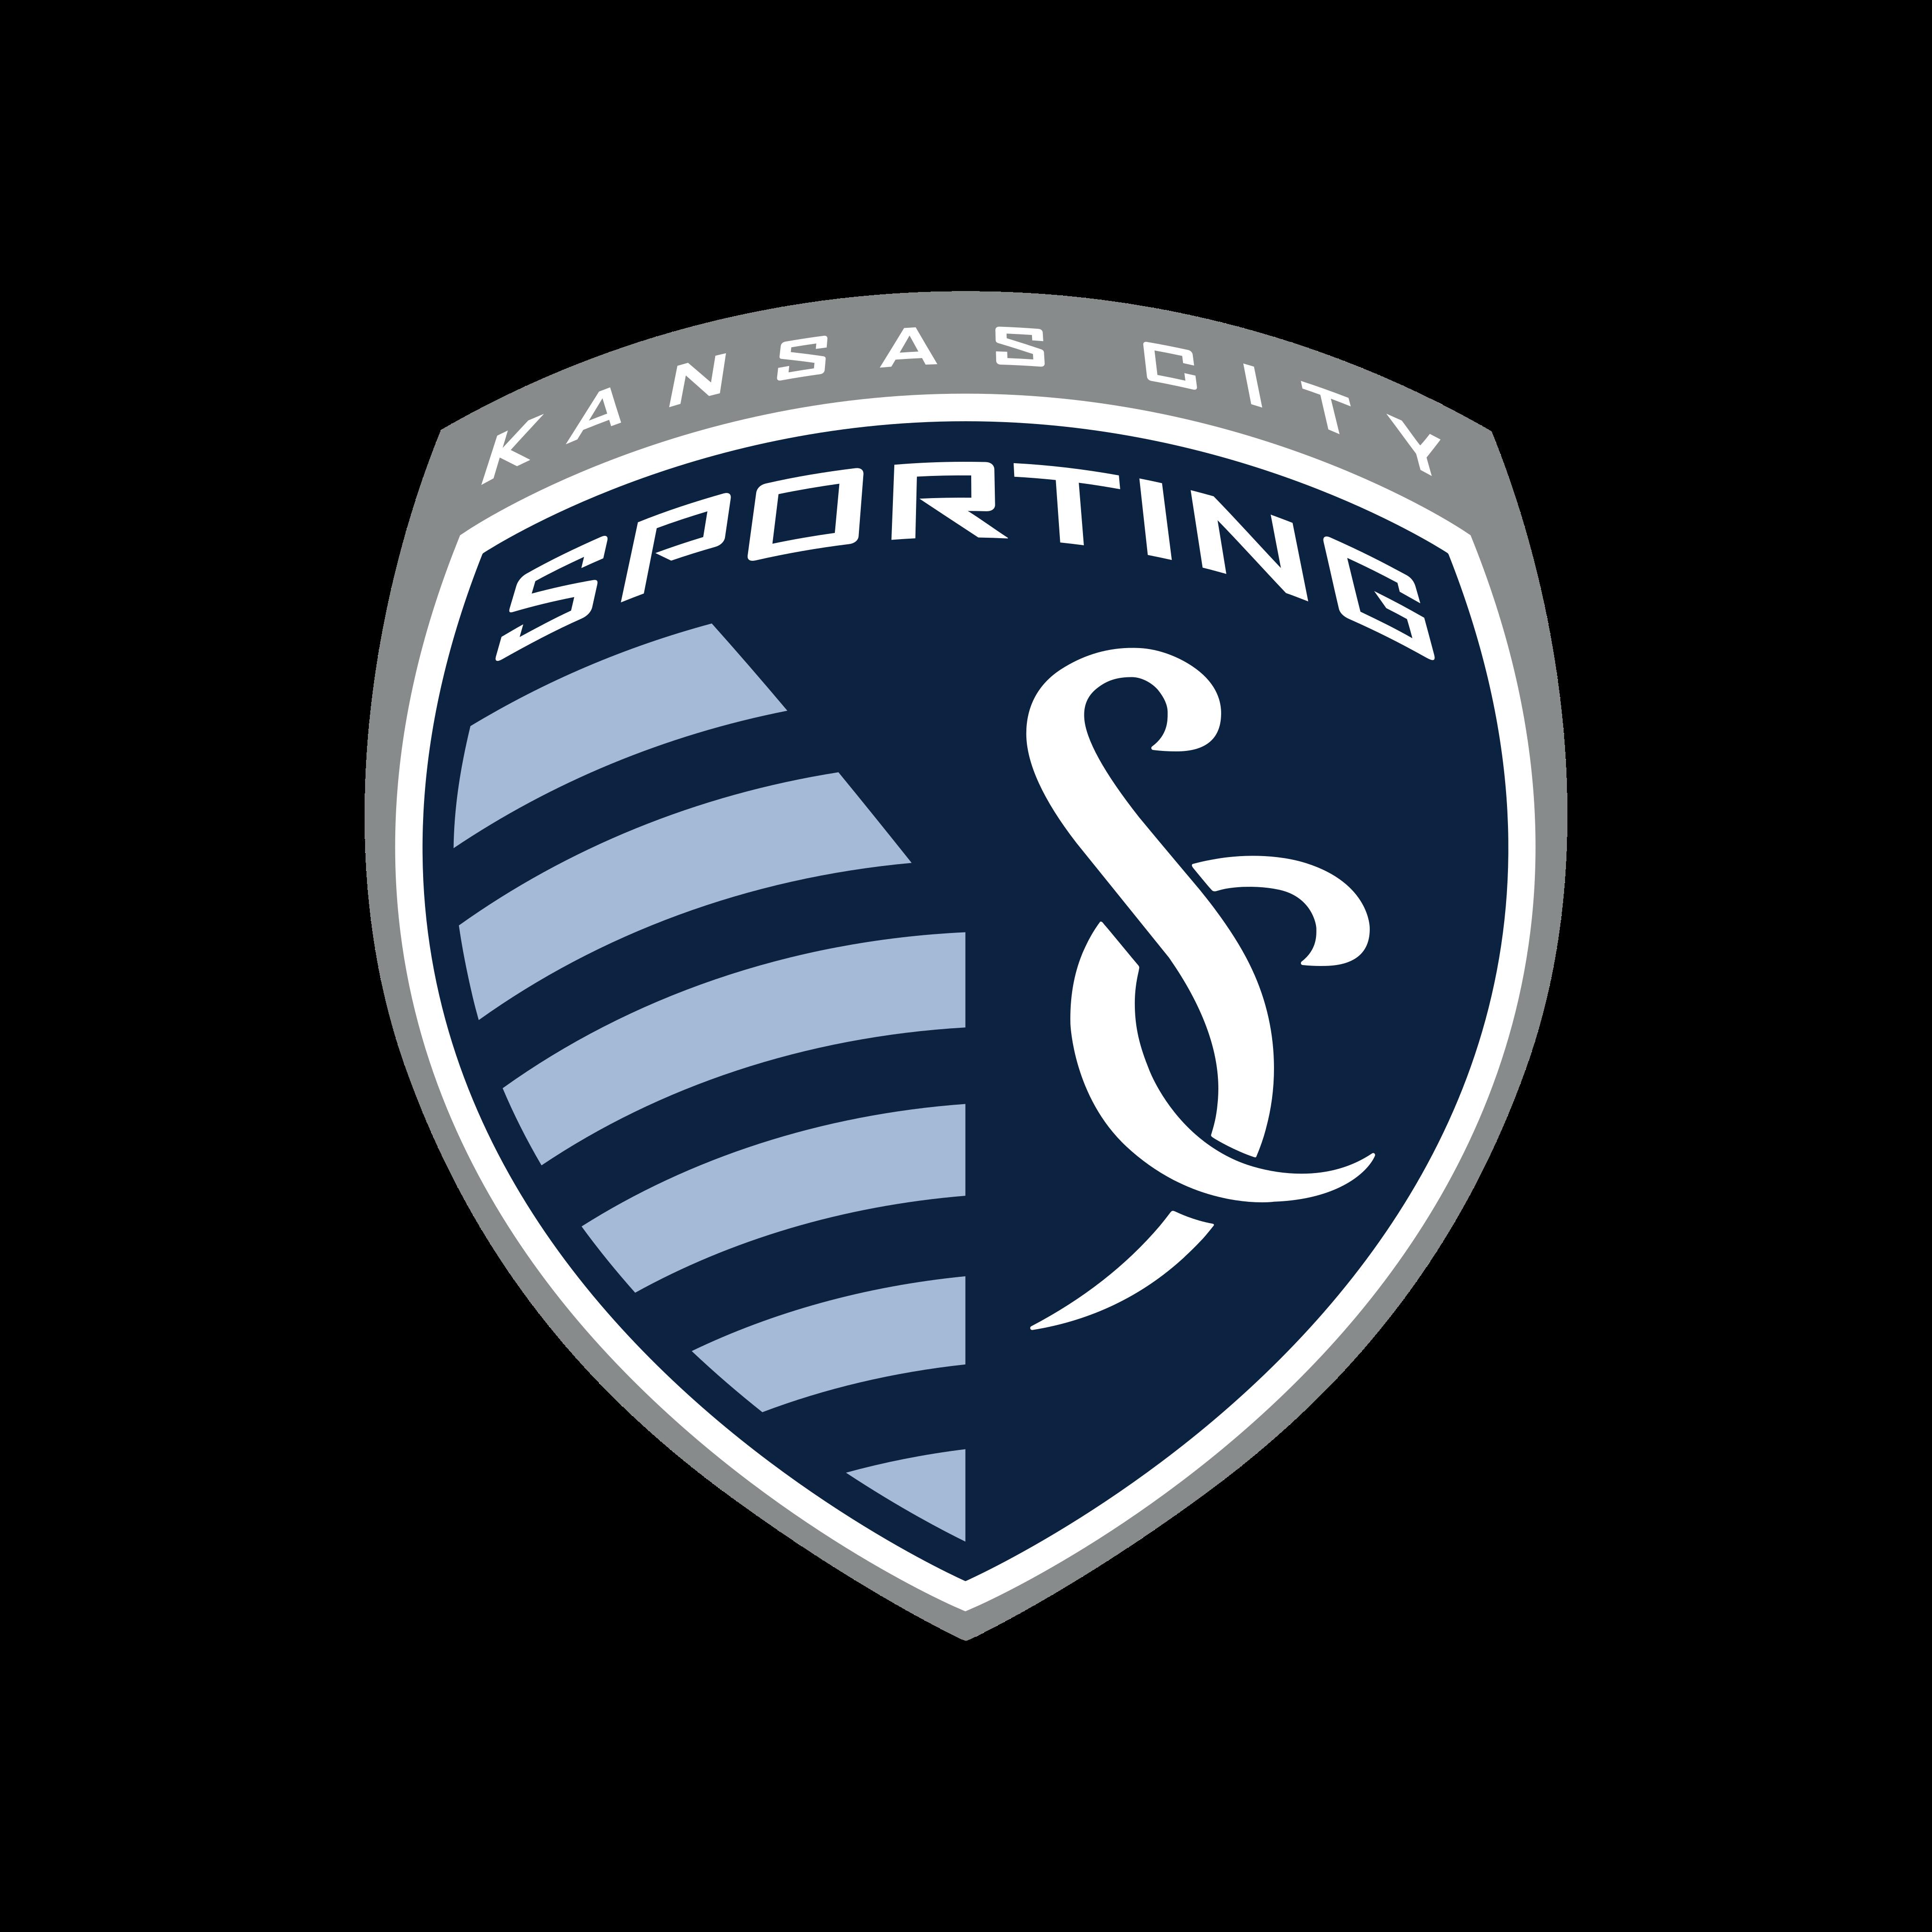 sporting kansas city logo 0 - Sporting Kansas City Logo